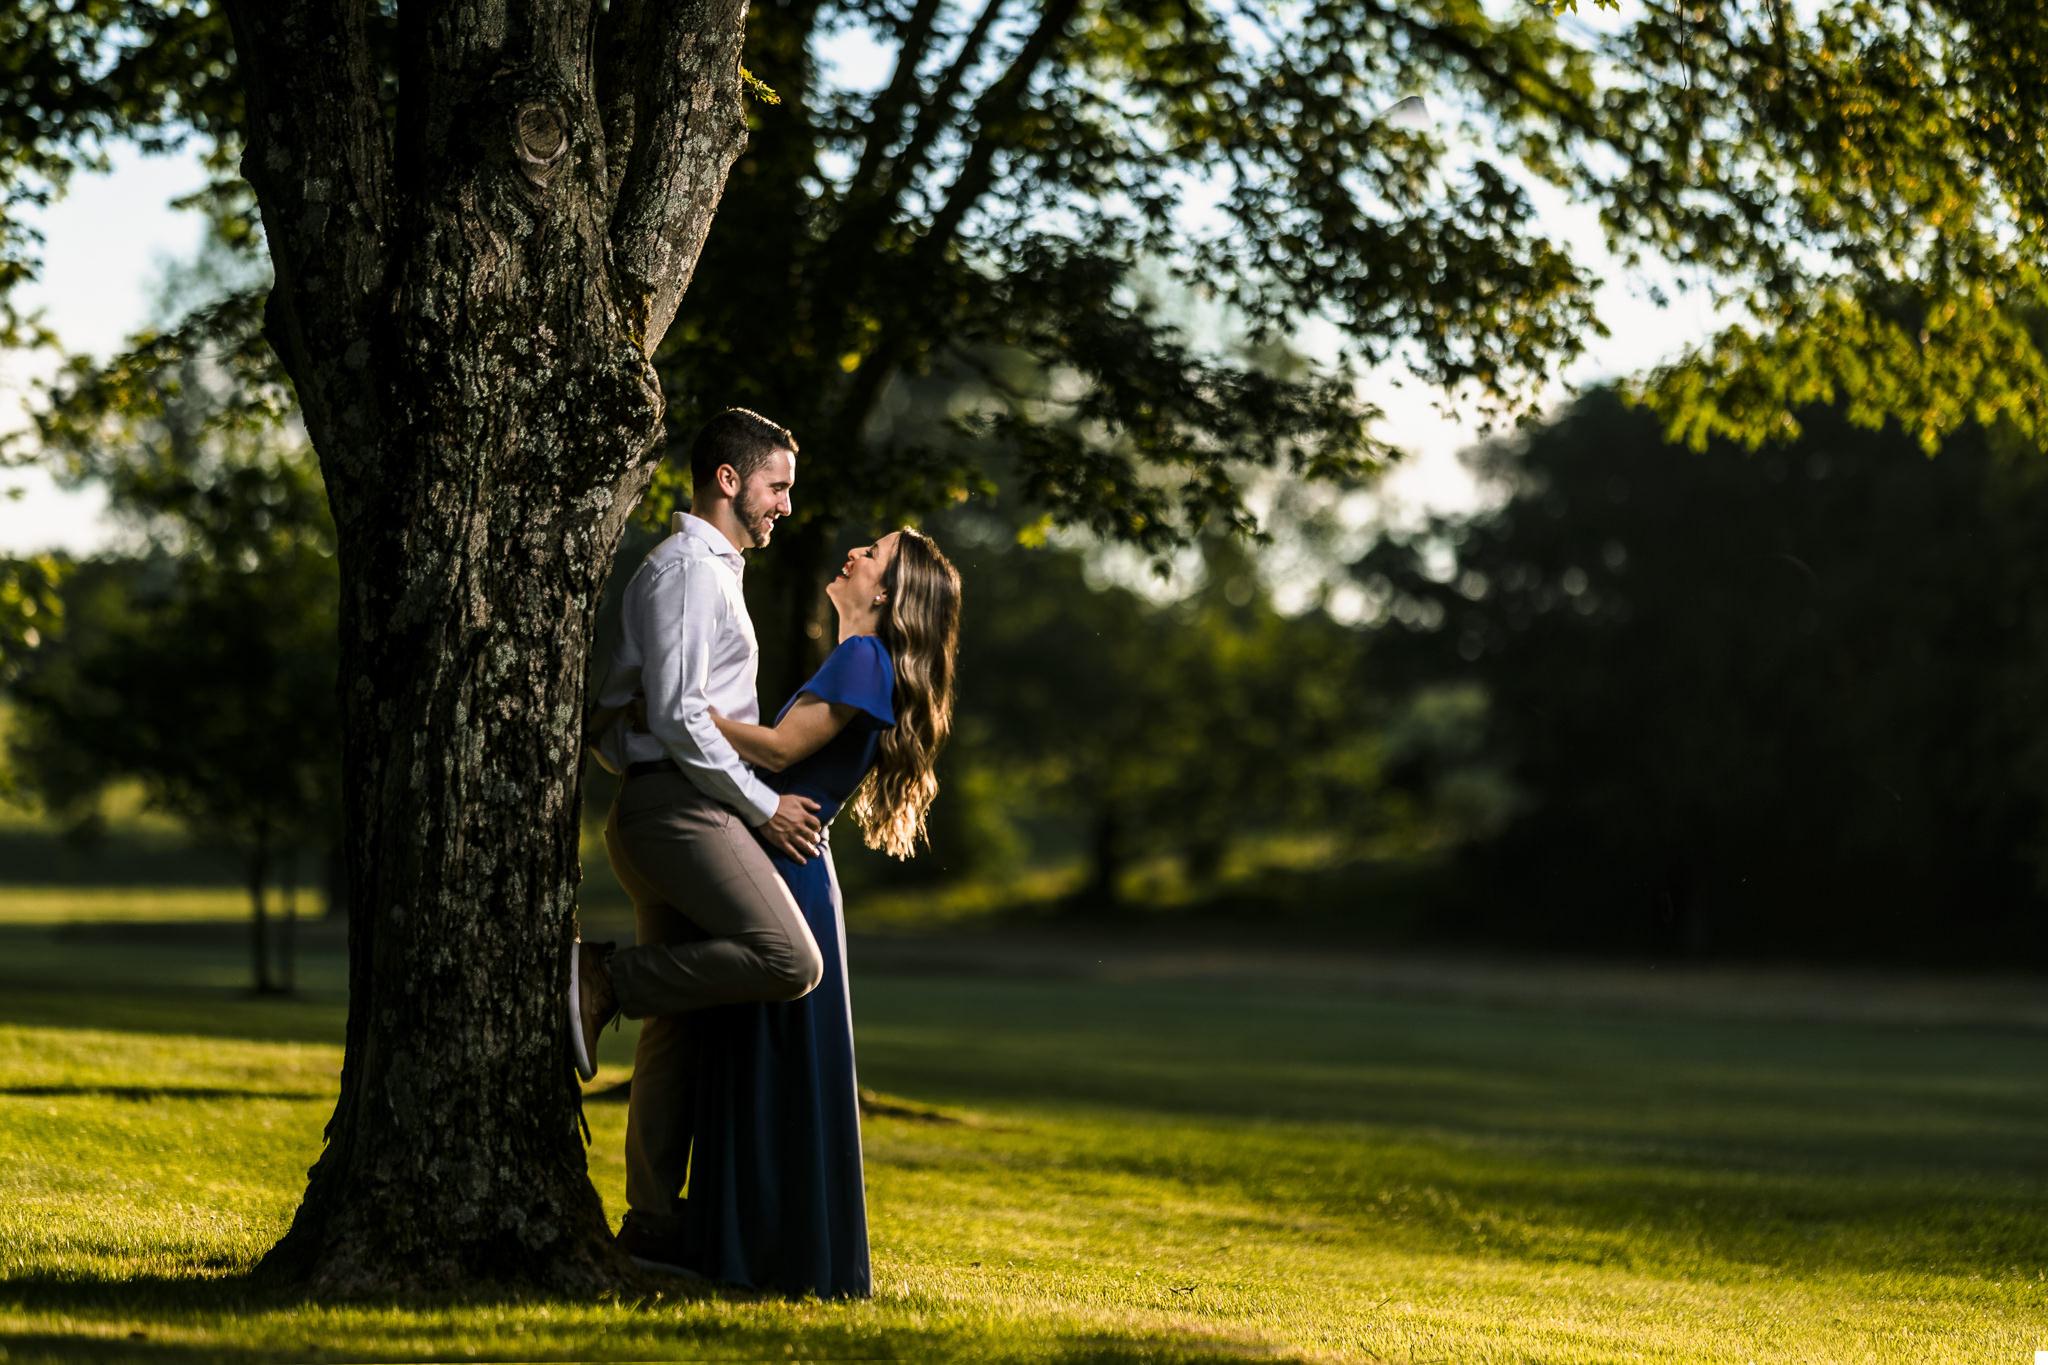 McKowen-Natirar-Park-Engagement-Photos-05.JPG